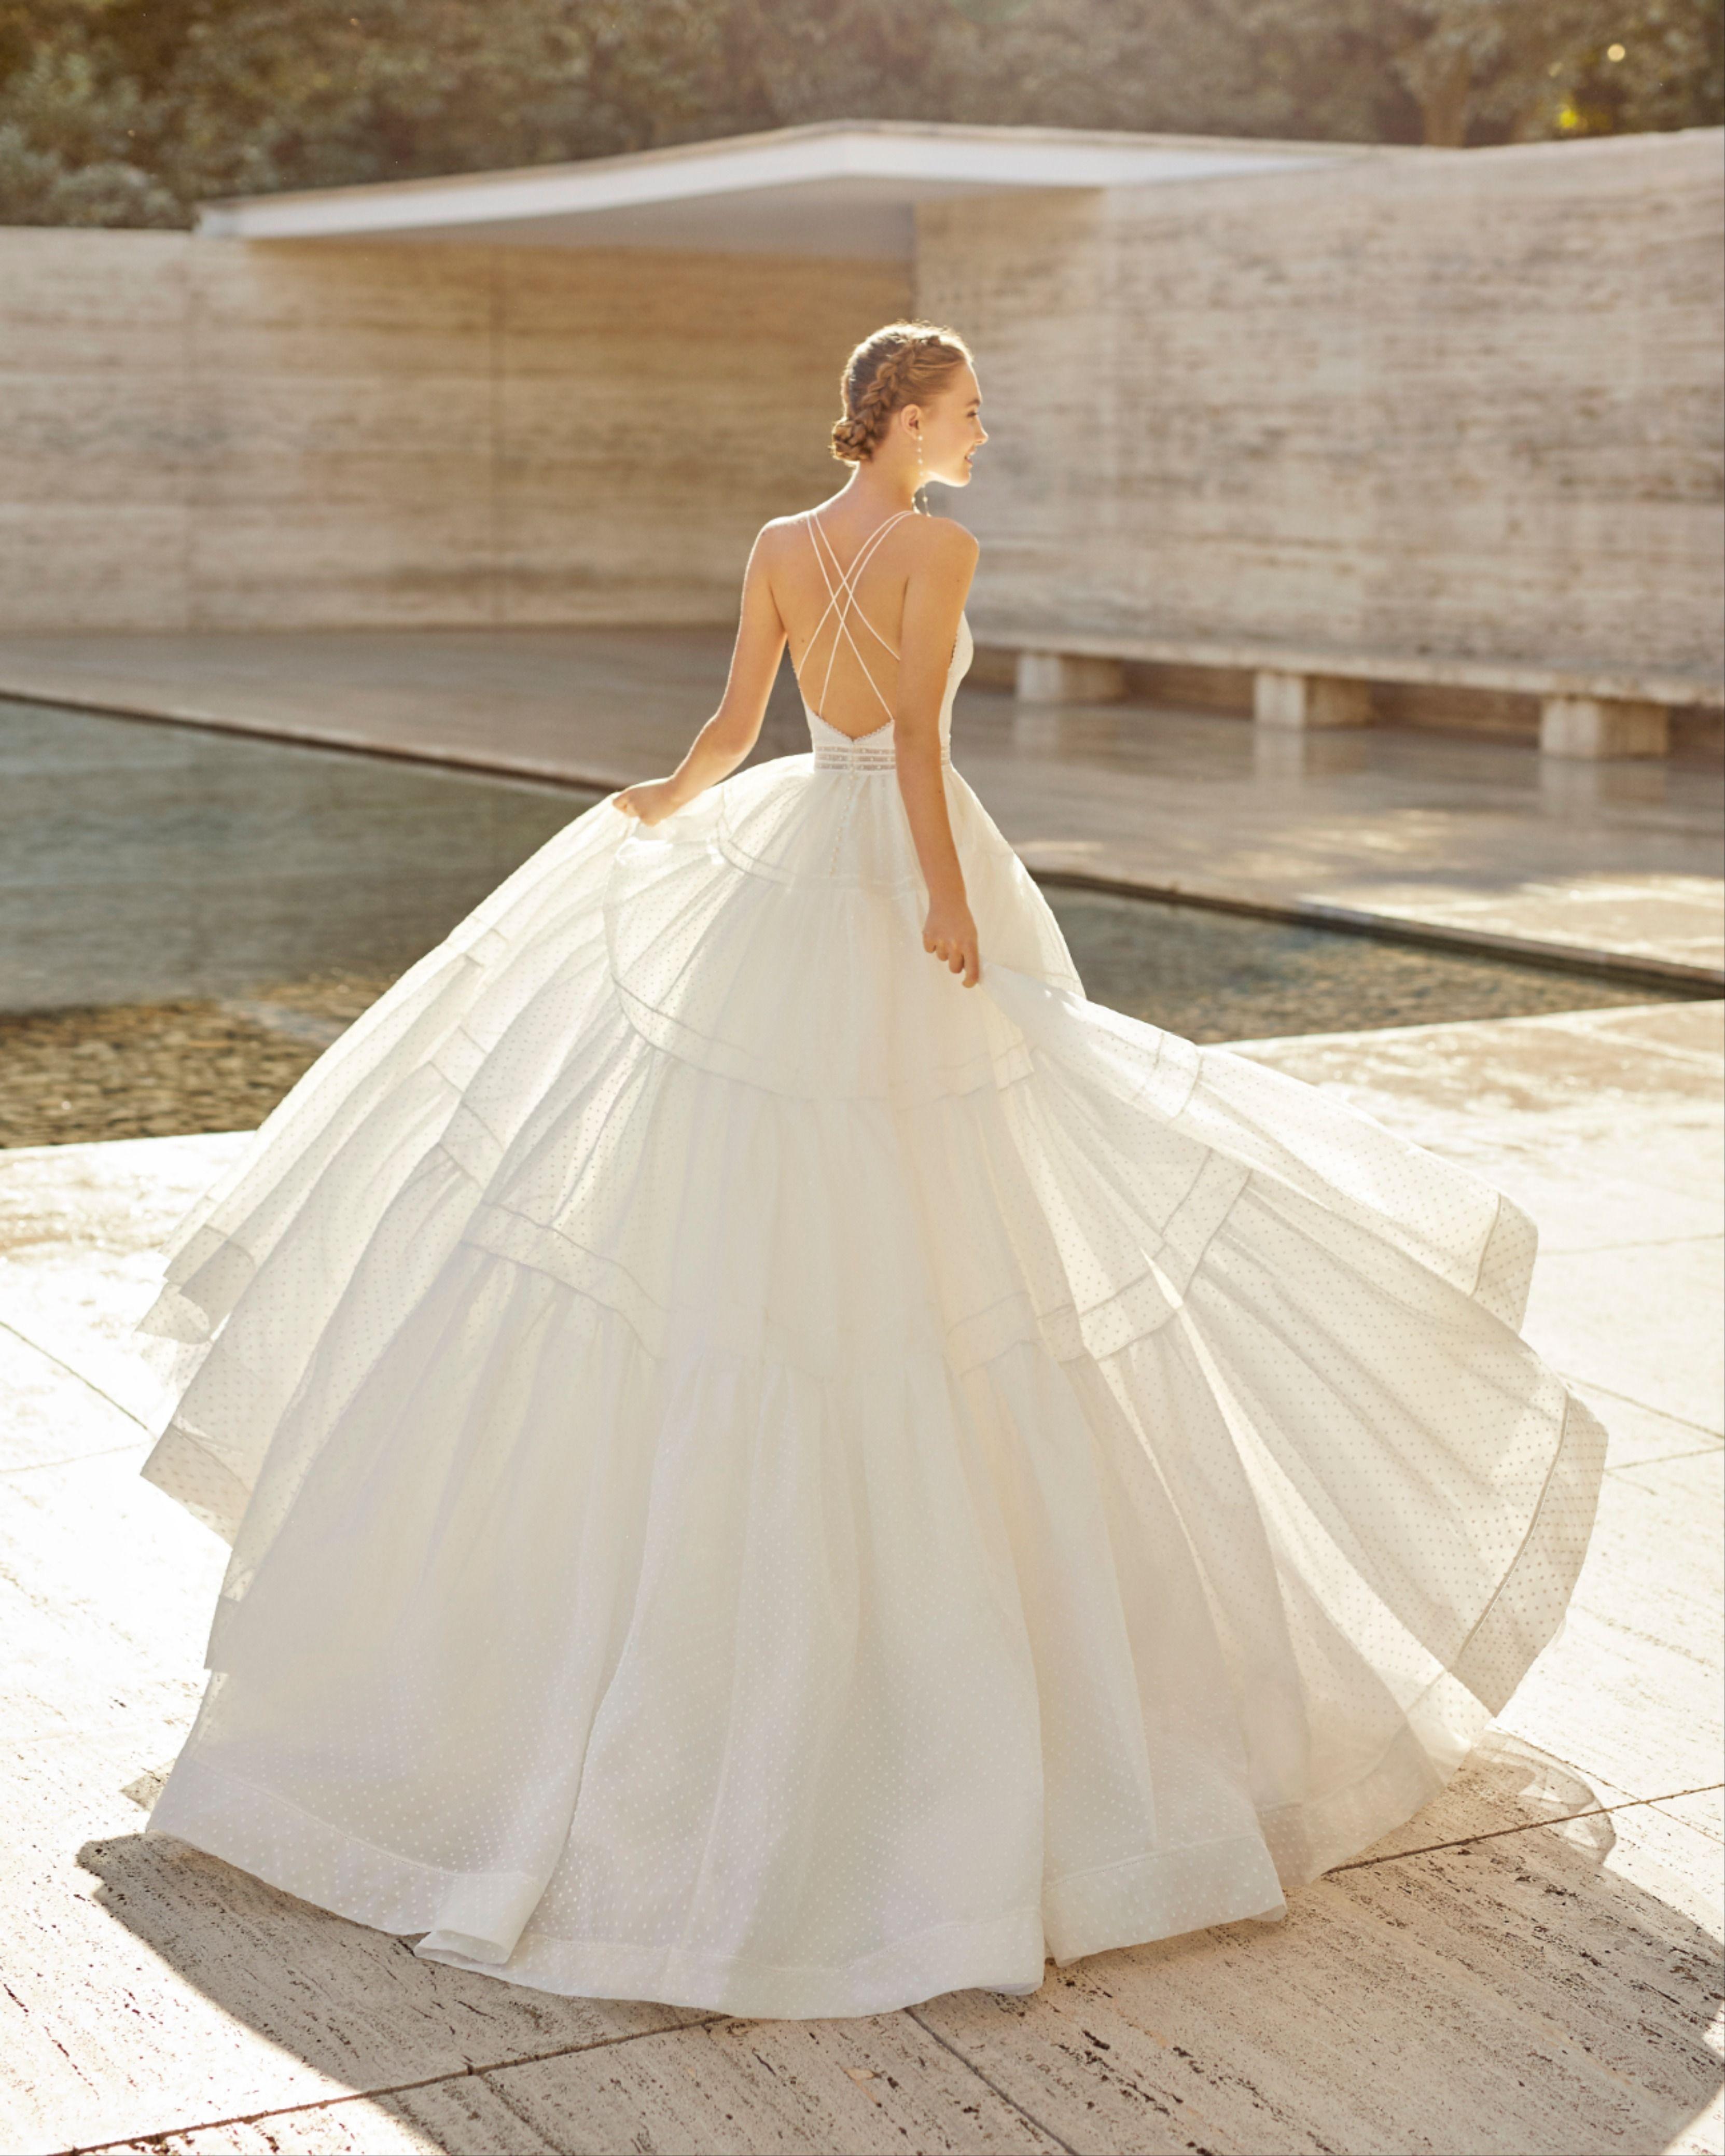 The Princess Style Wedding Dresses Fashion Gens [ 1024 x 942 Pixel ]